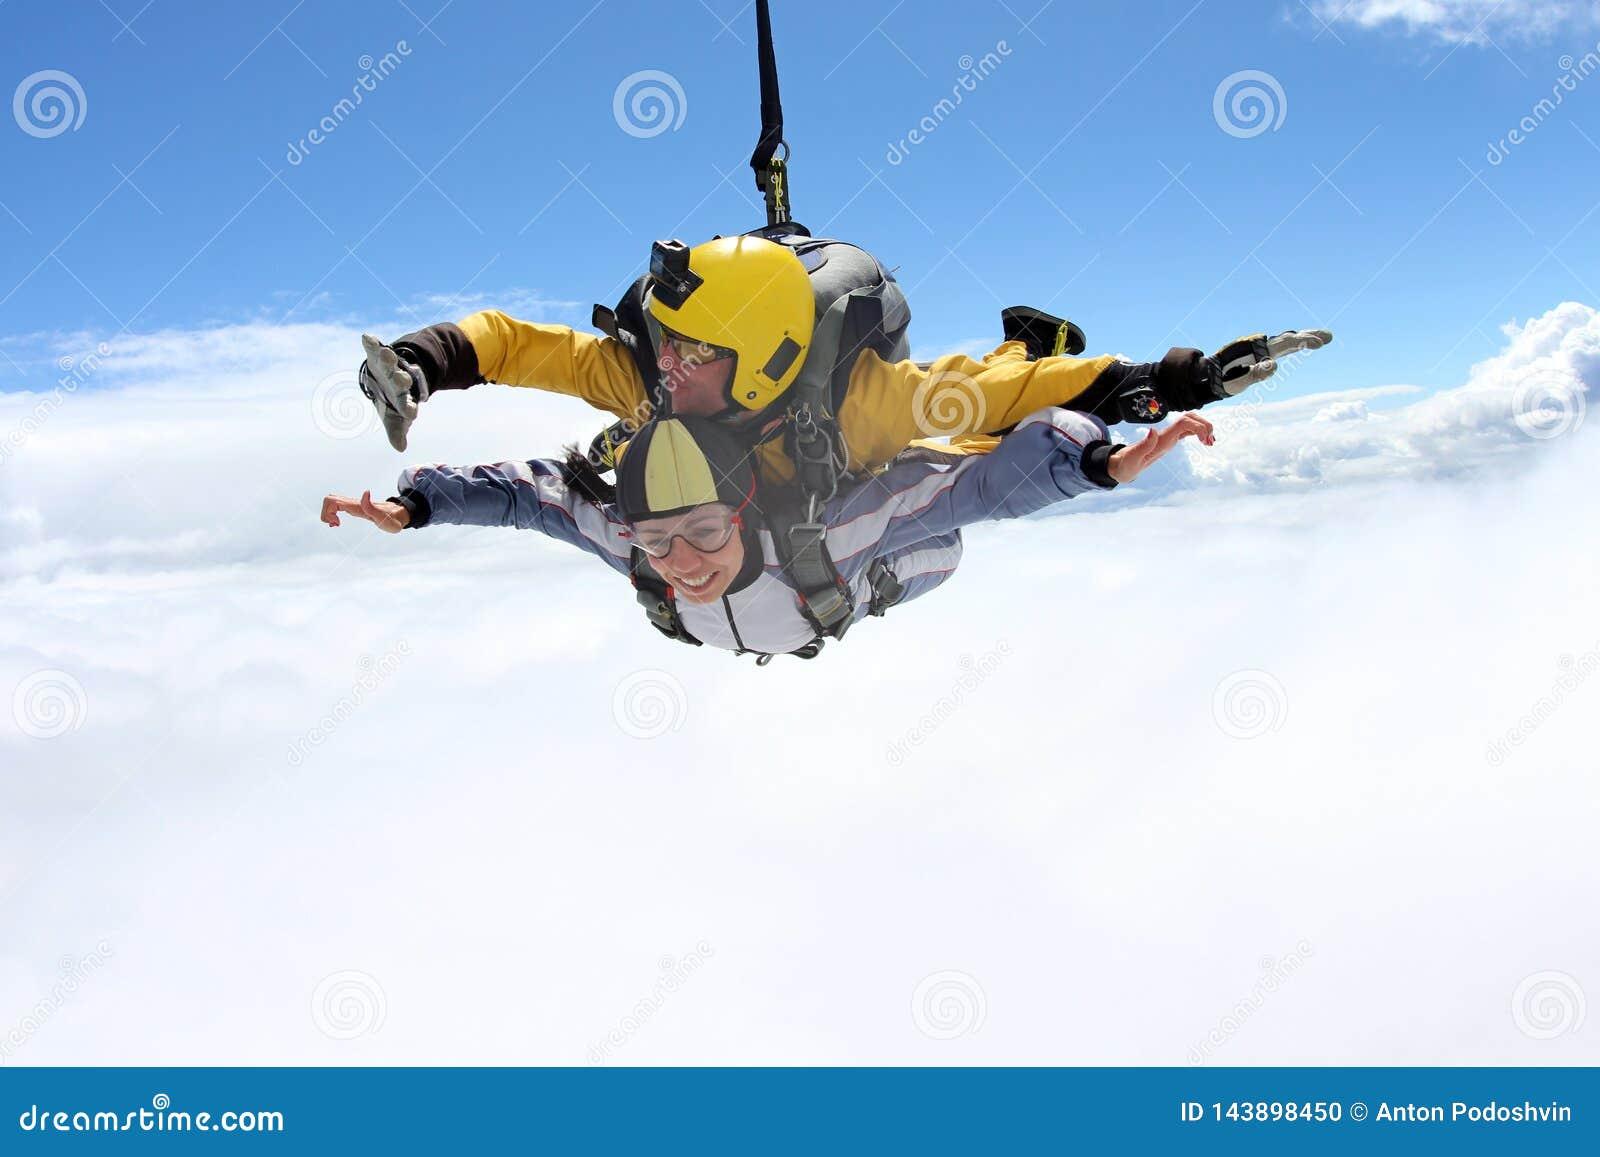 Salto in tandem Lanciando in caduta liberasi nel cielo blu